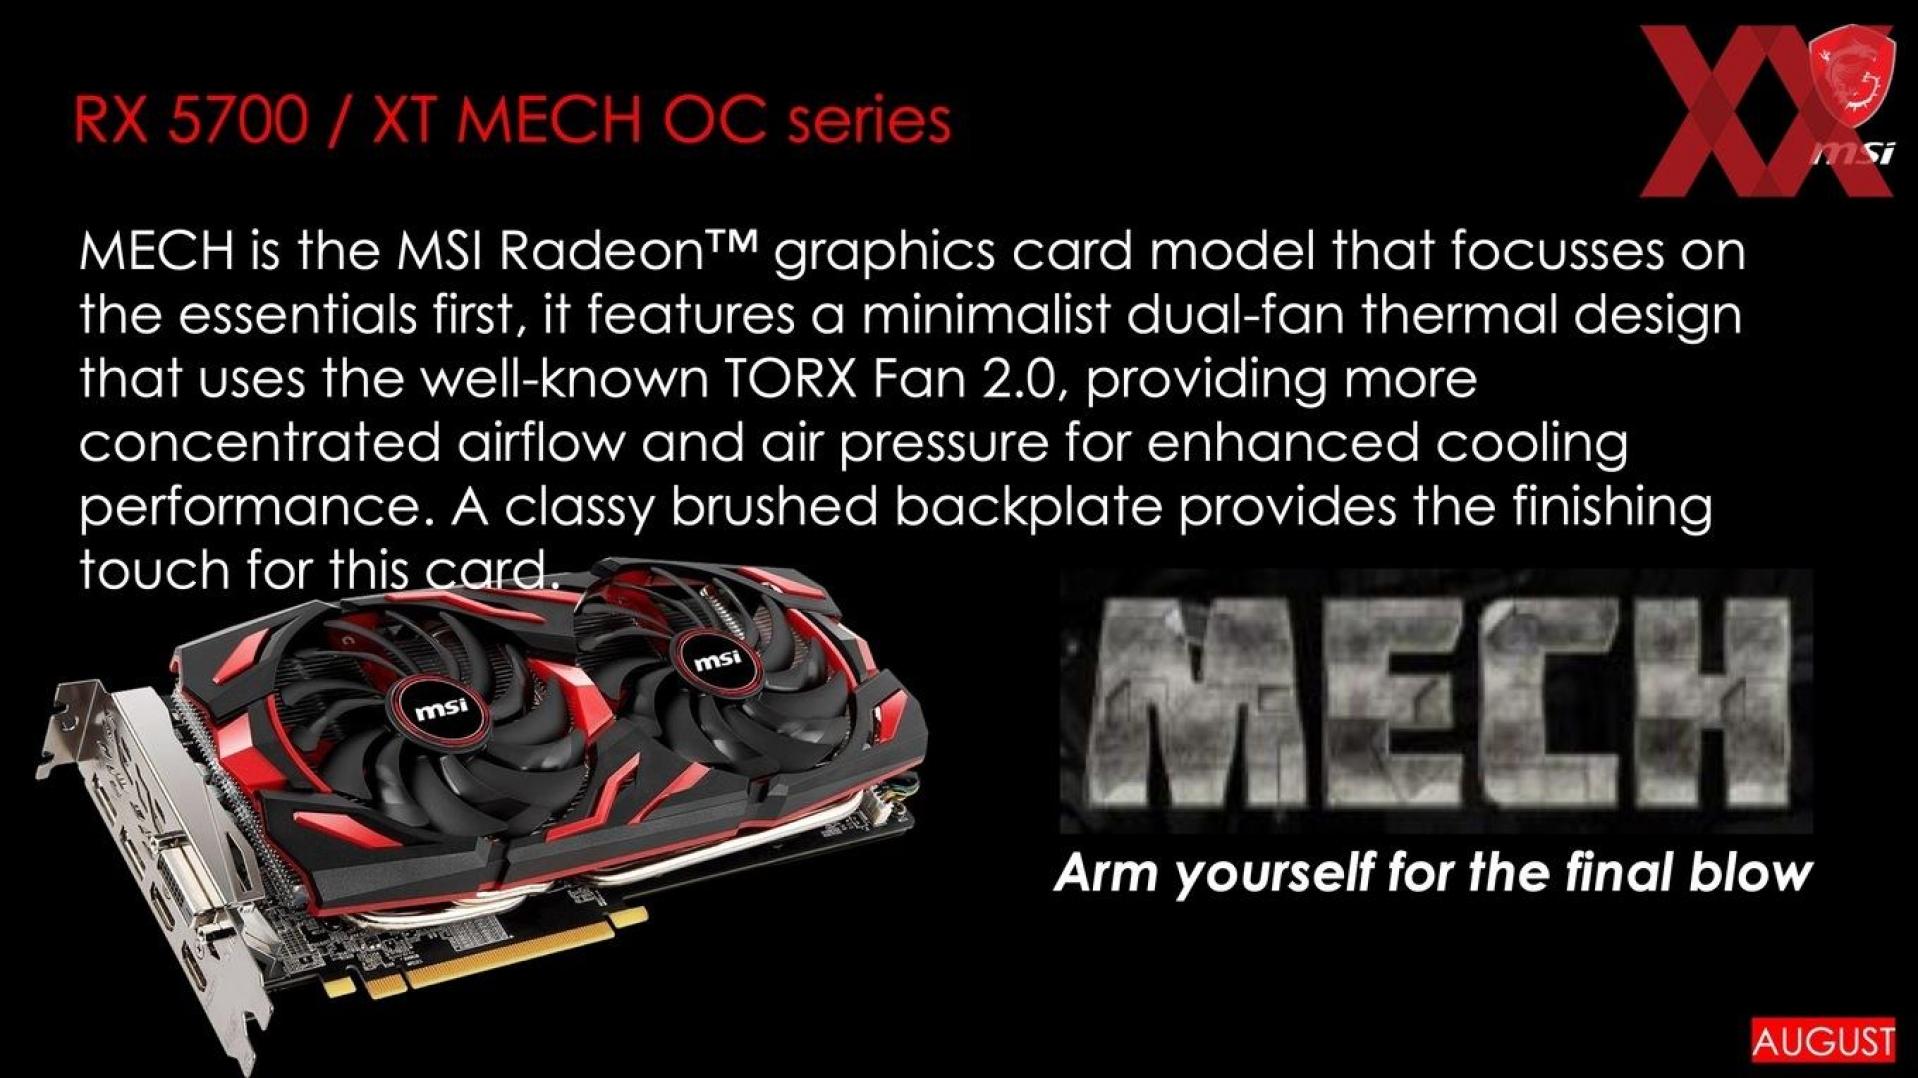 MSI เตรียมเปิดตัวการ์ด Custom ของ Radeon RX 5700-series ถึง